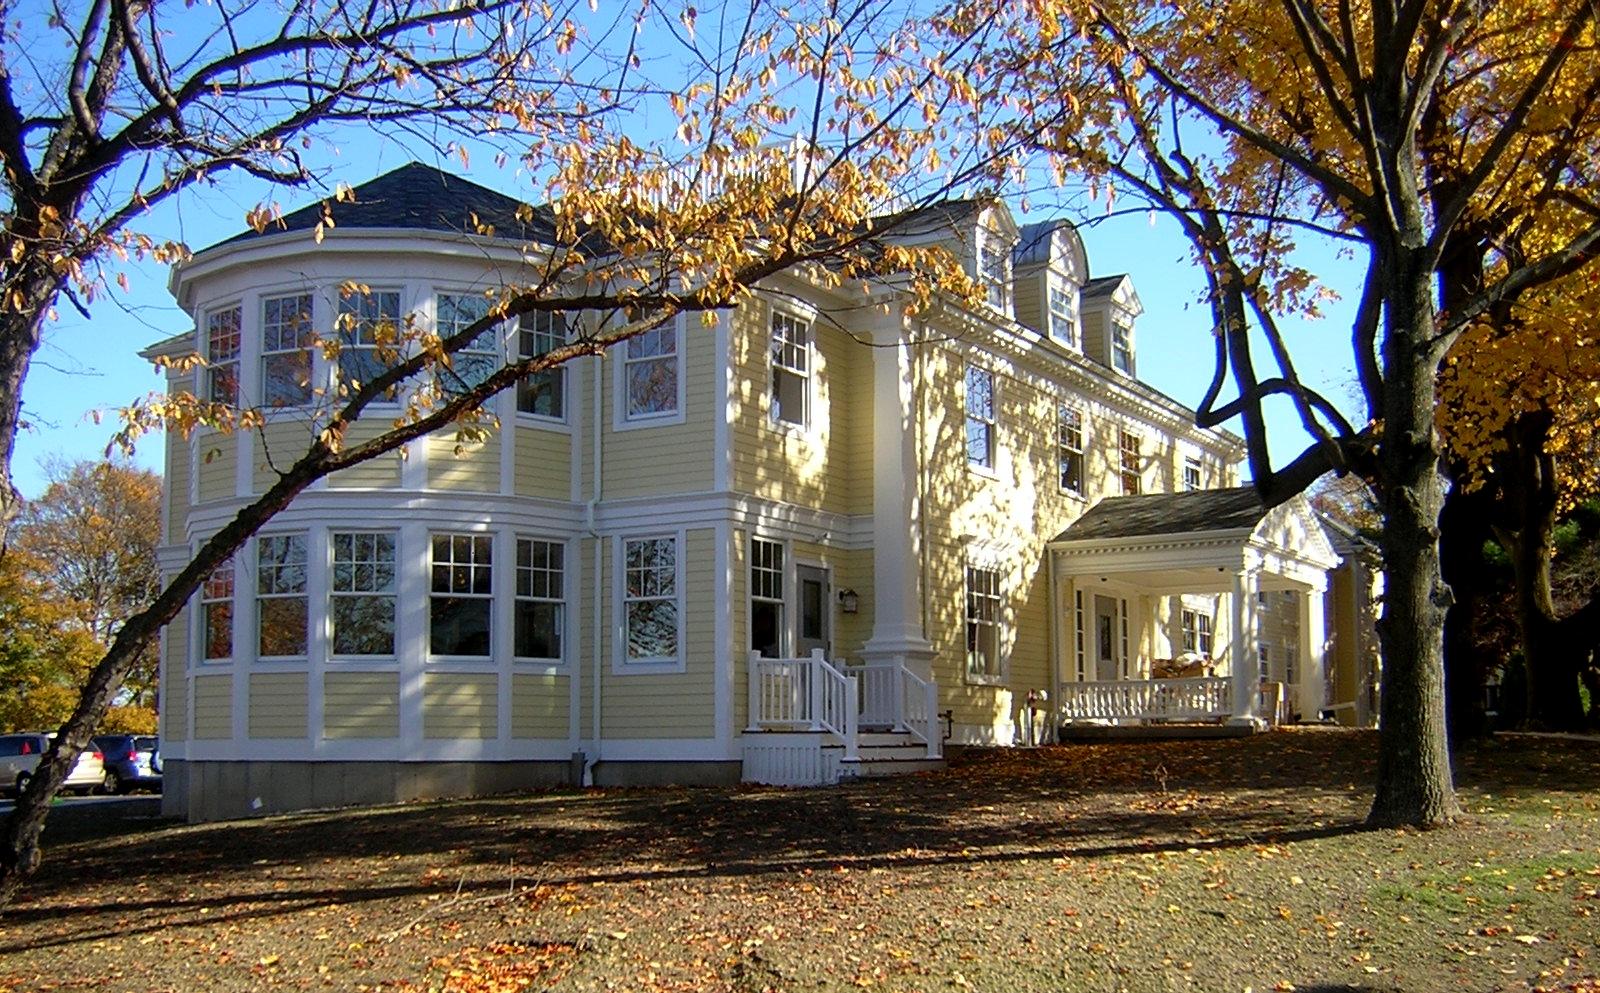 Quincy Massachusetts